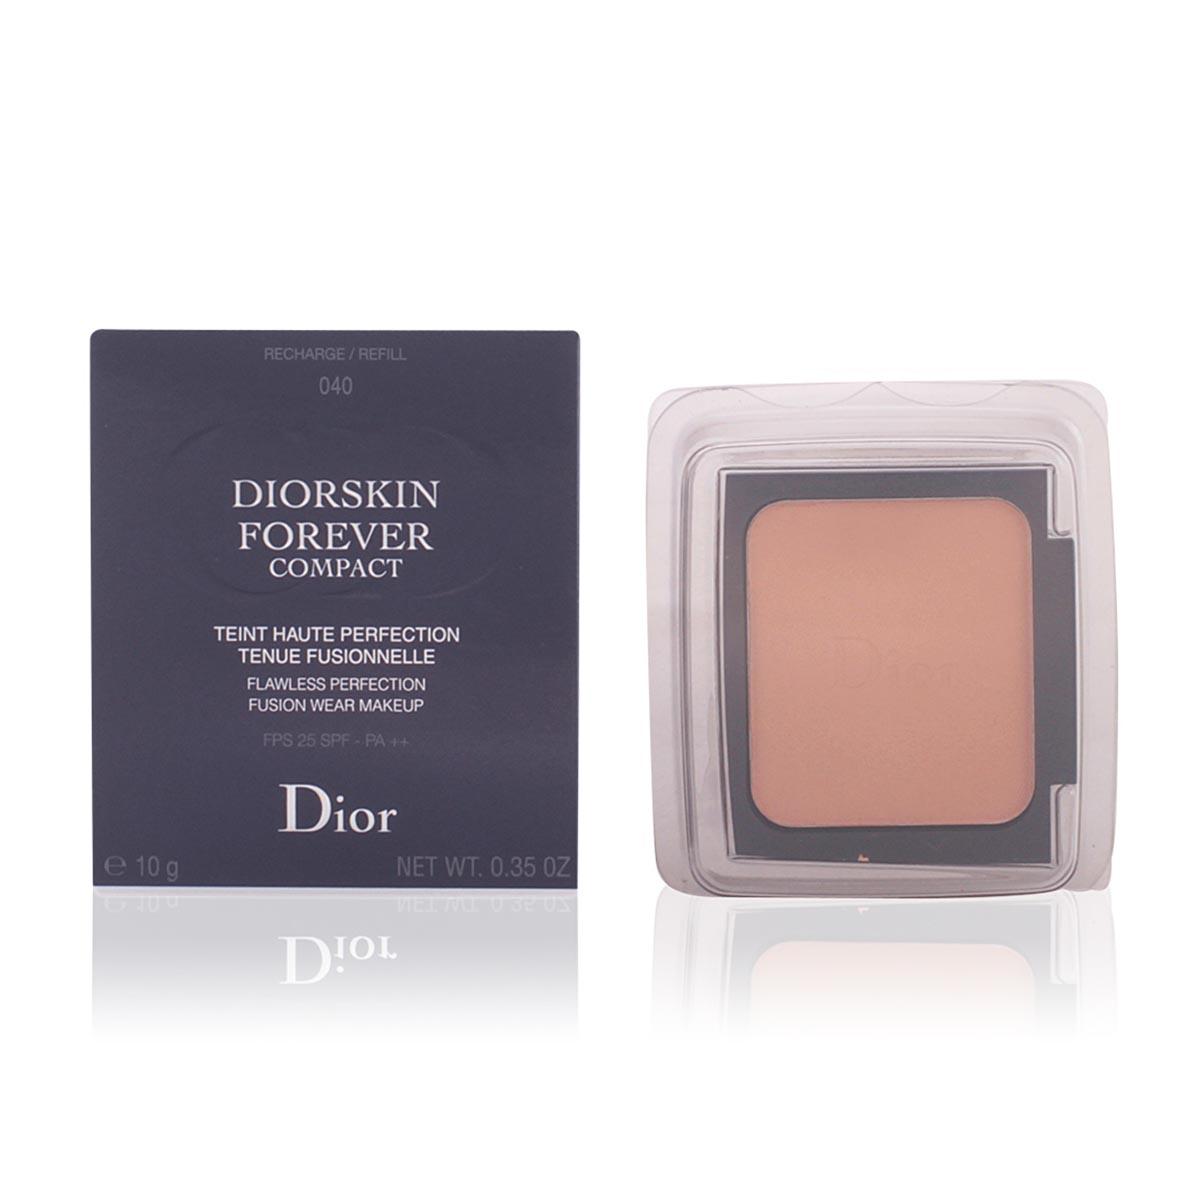 Dior diorskin forever compact powder refill 040